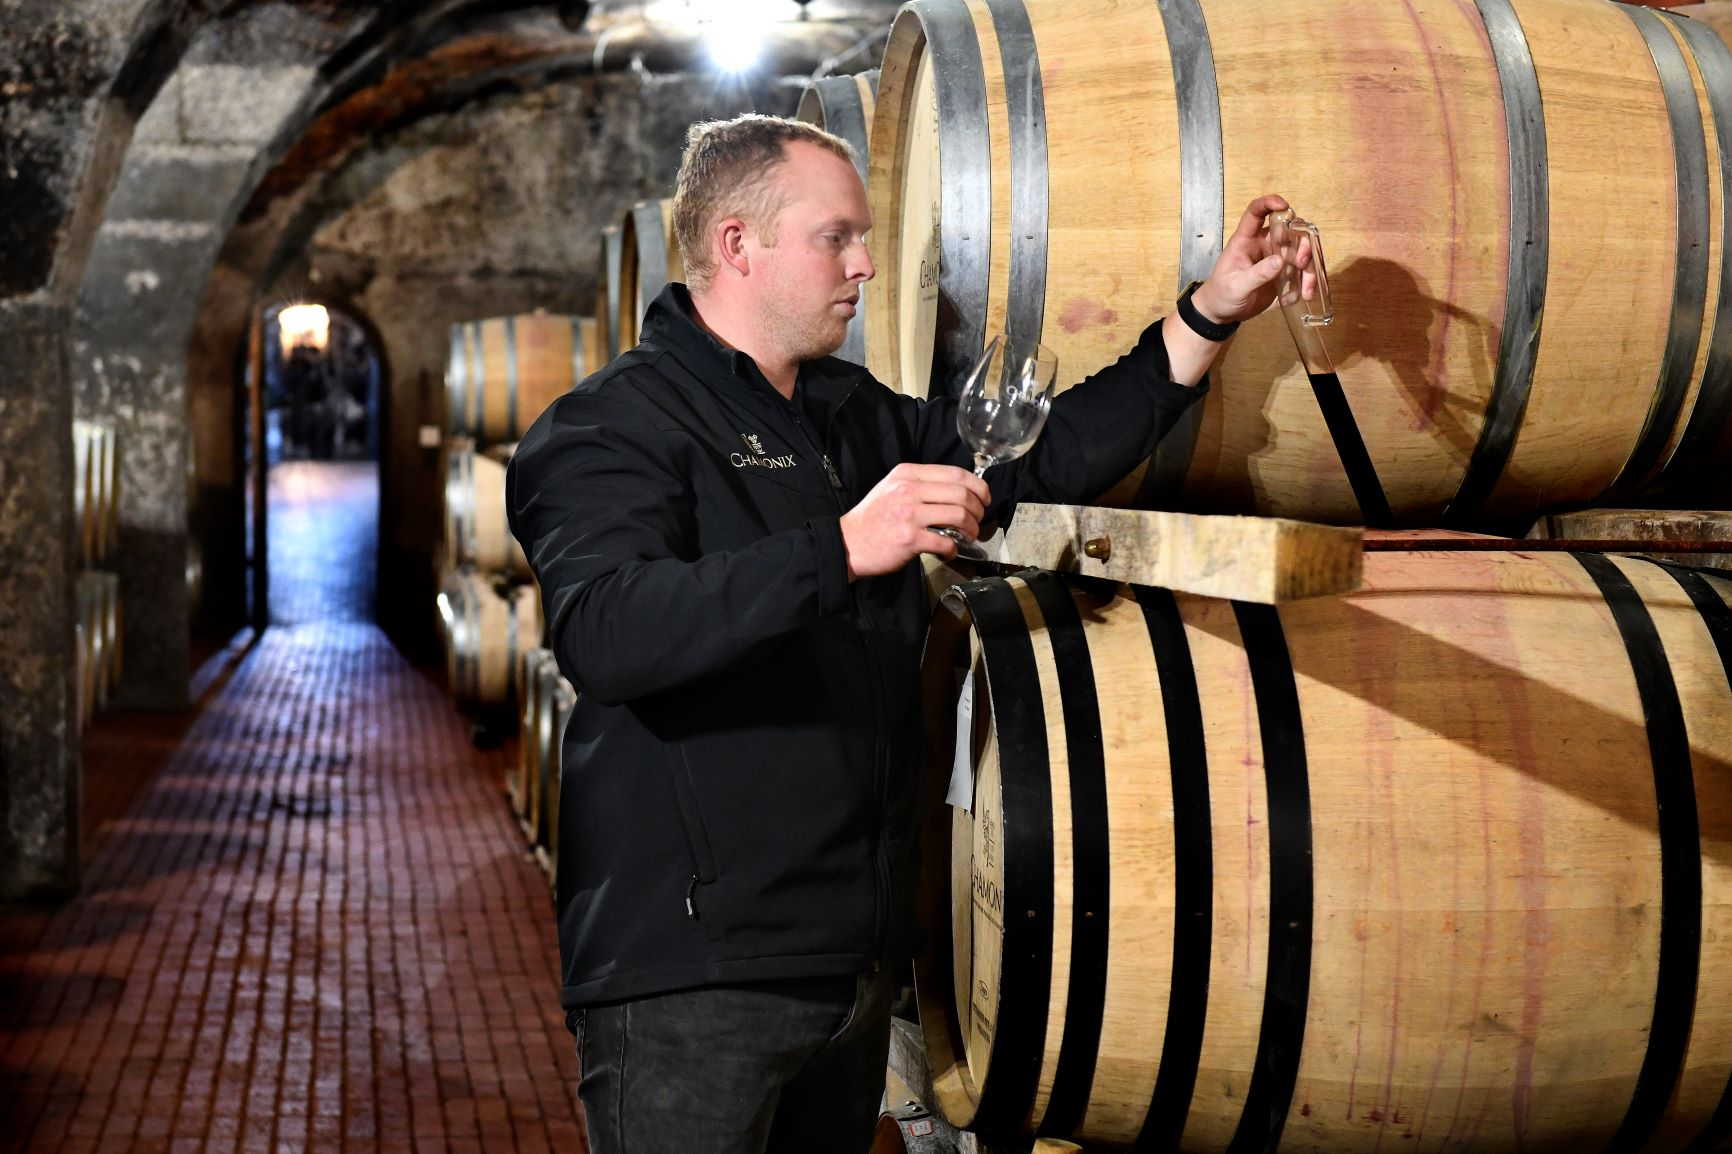 Youthful Beauty in Chamonix's Early Wines photo